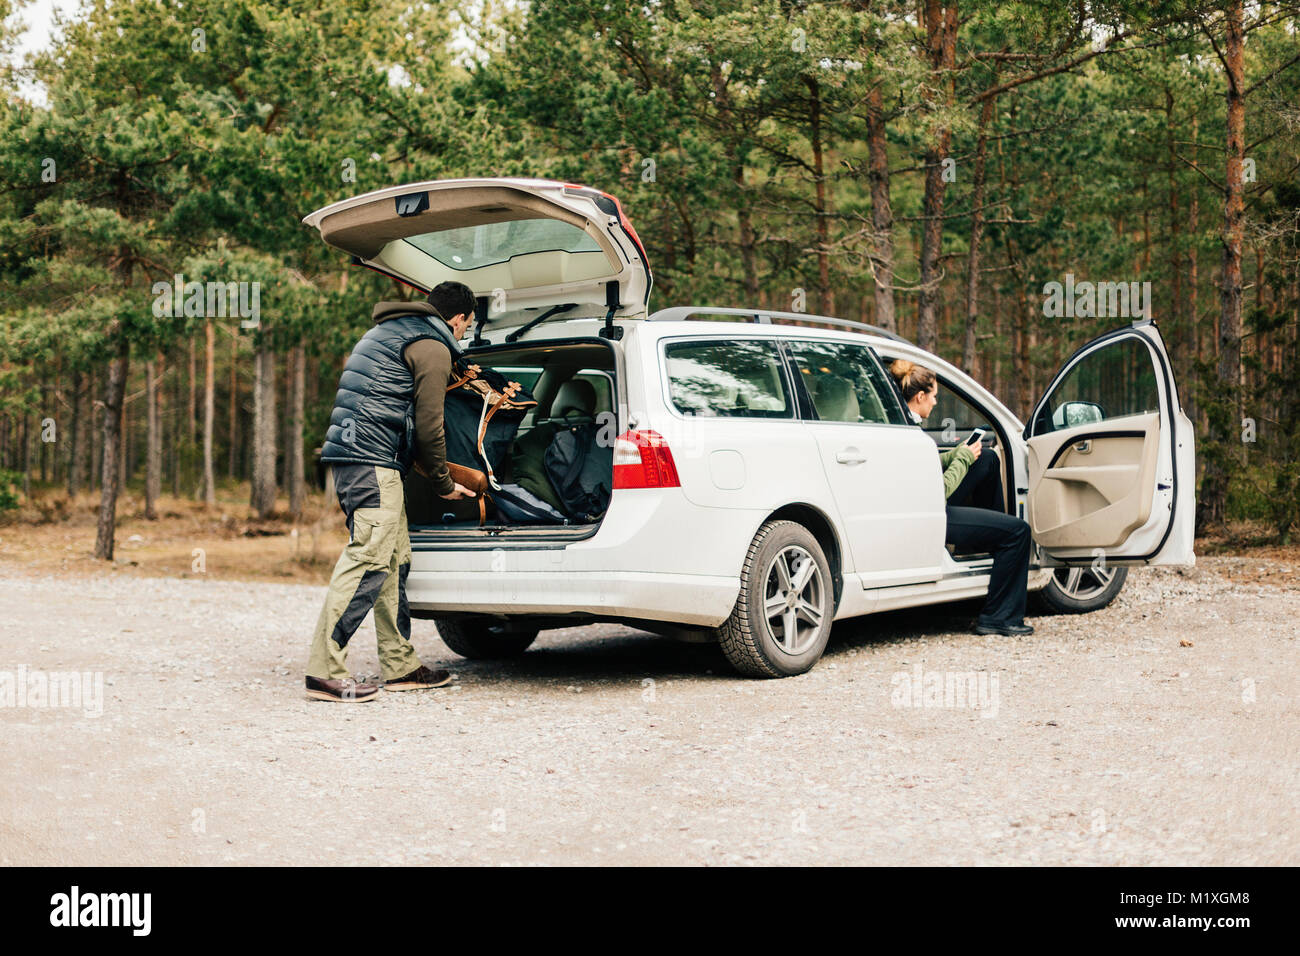 Man loading bags in car in Sodermanland, Sweden - Stock Image